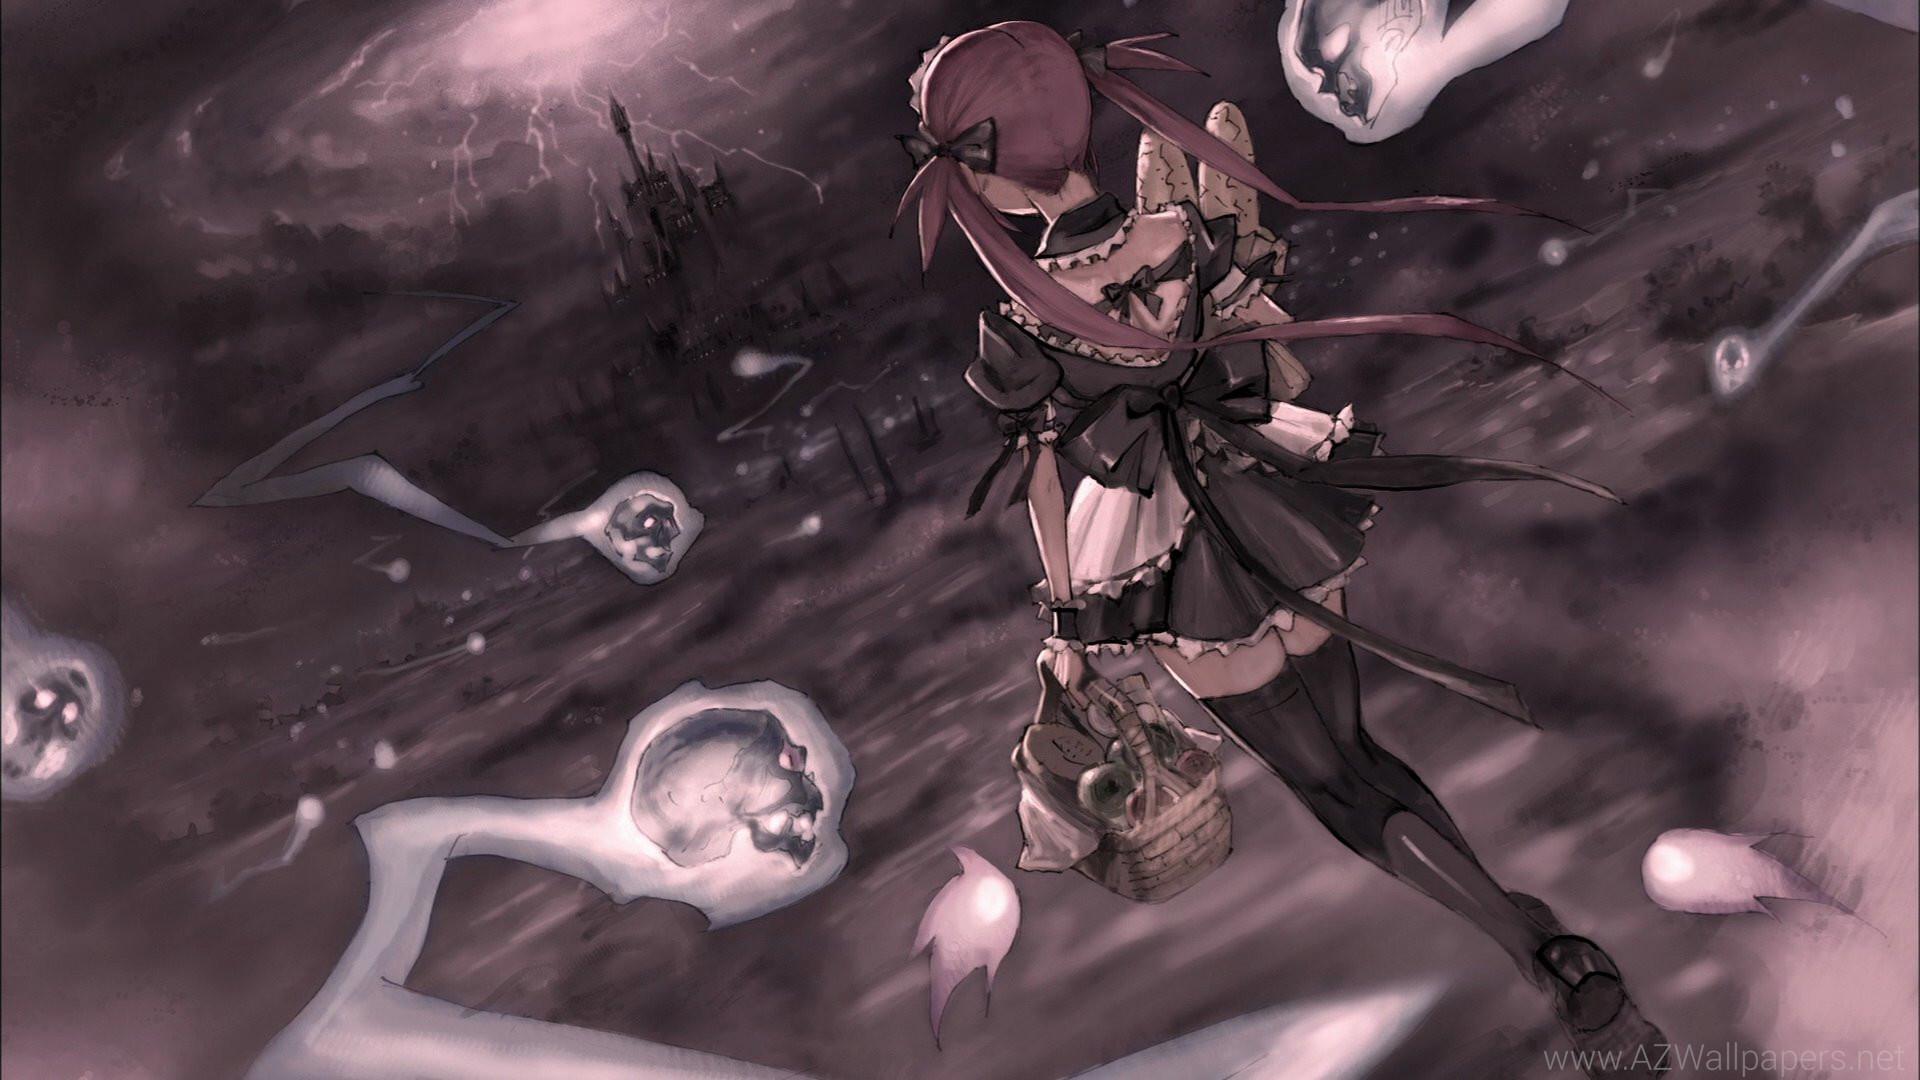 Queen's Blade Anime Girl Skull Wallpapers